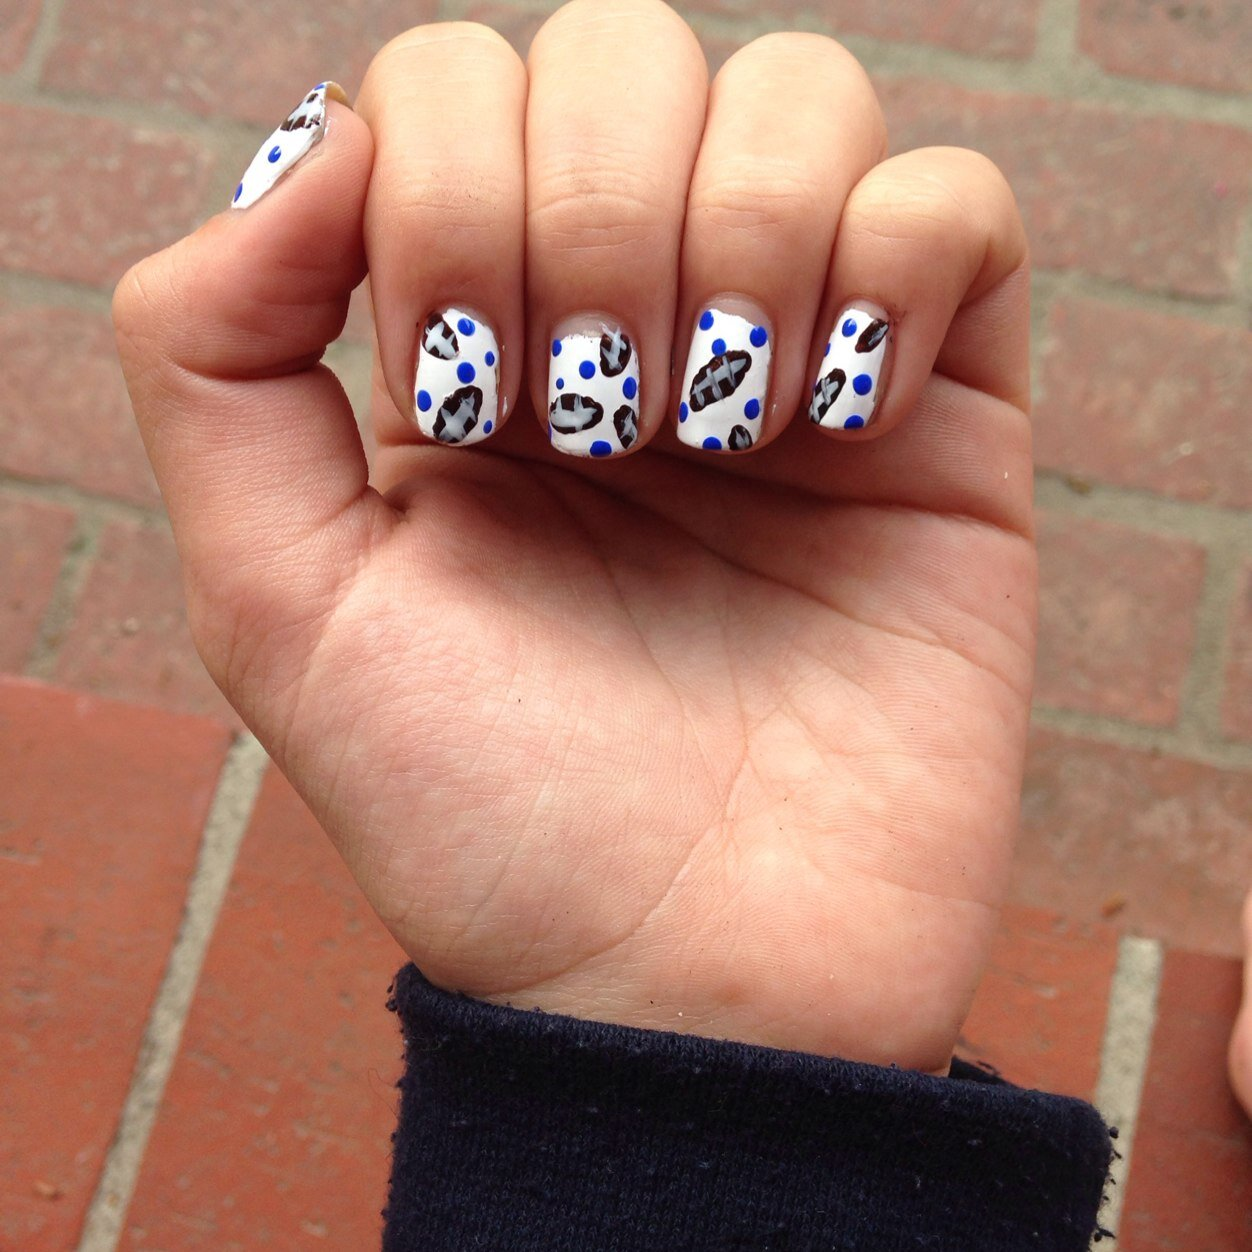 Nail Designs! (@naildesignsx) | Twitter